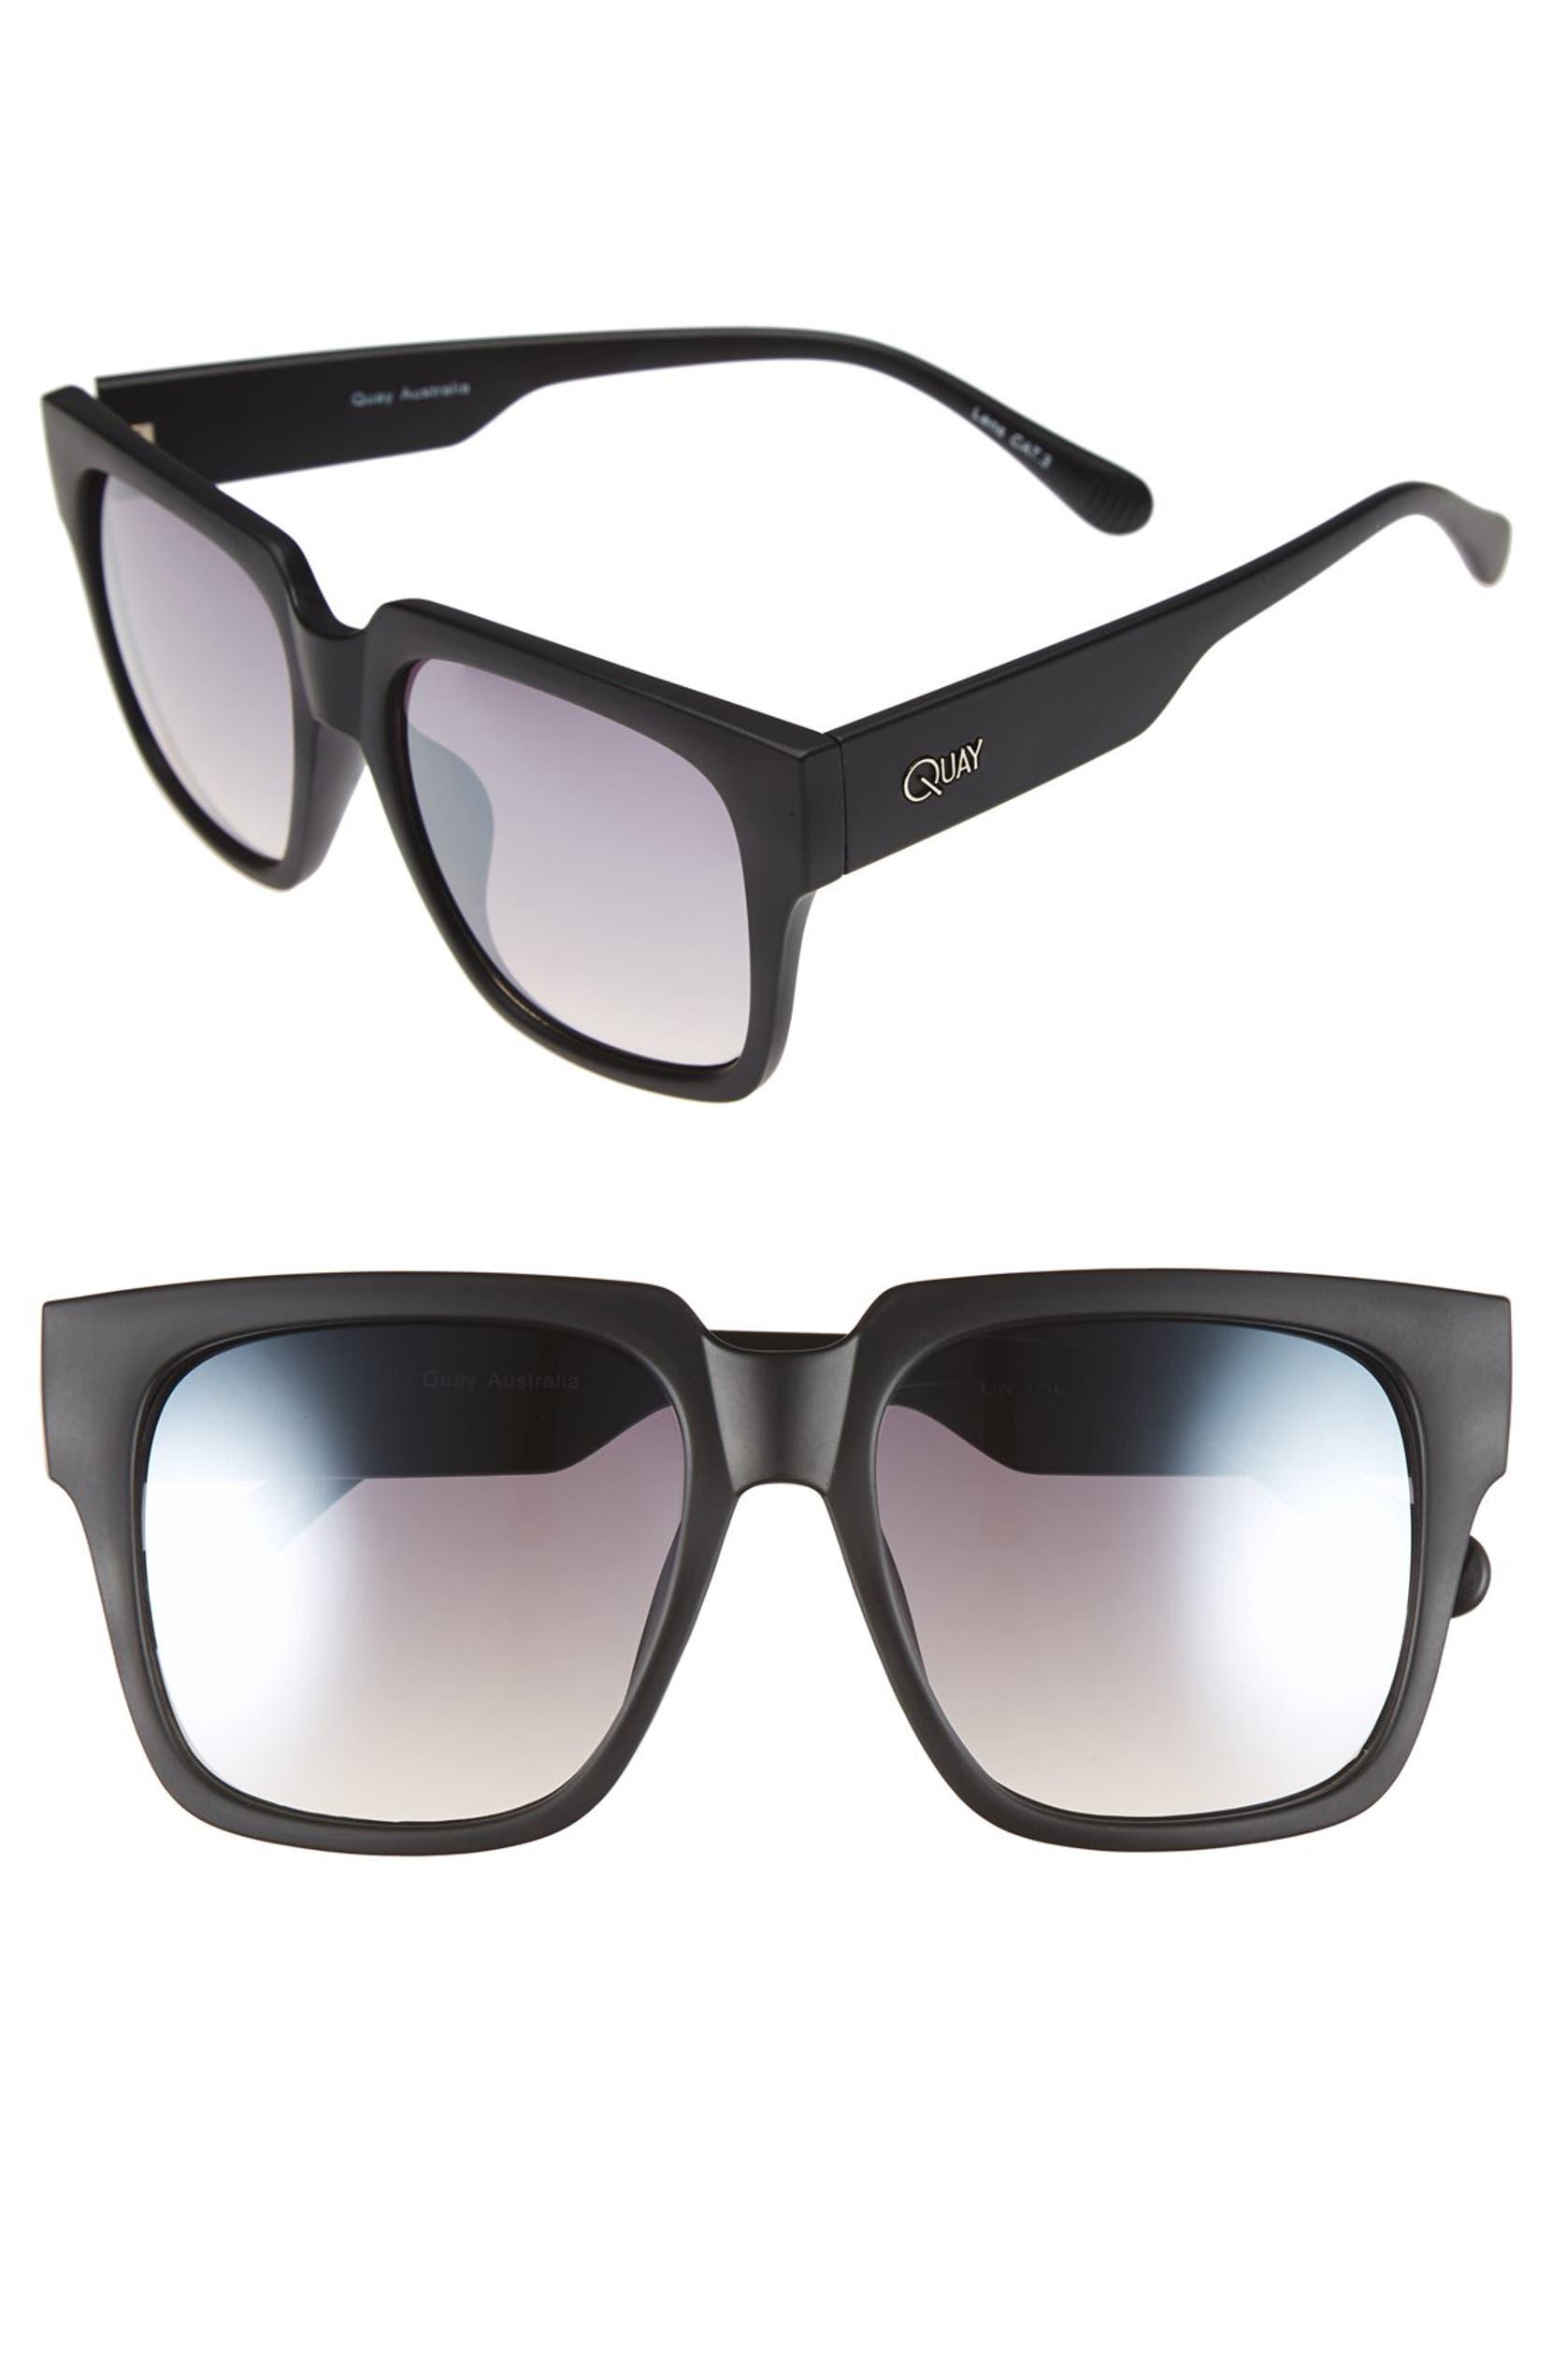 733b0e329b Quay Australia  On the Prowl  55mm Square Sunglasses